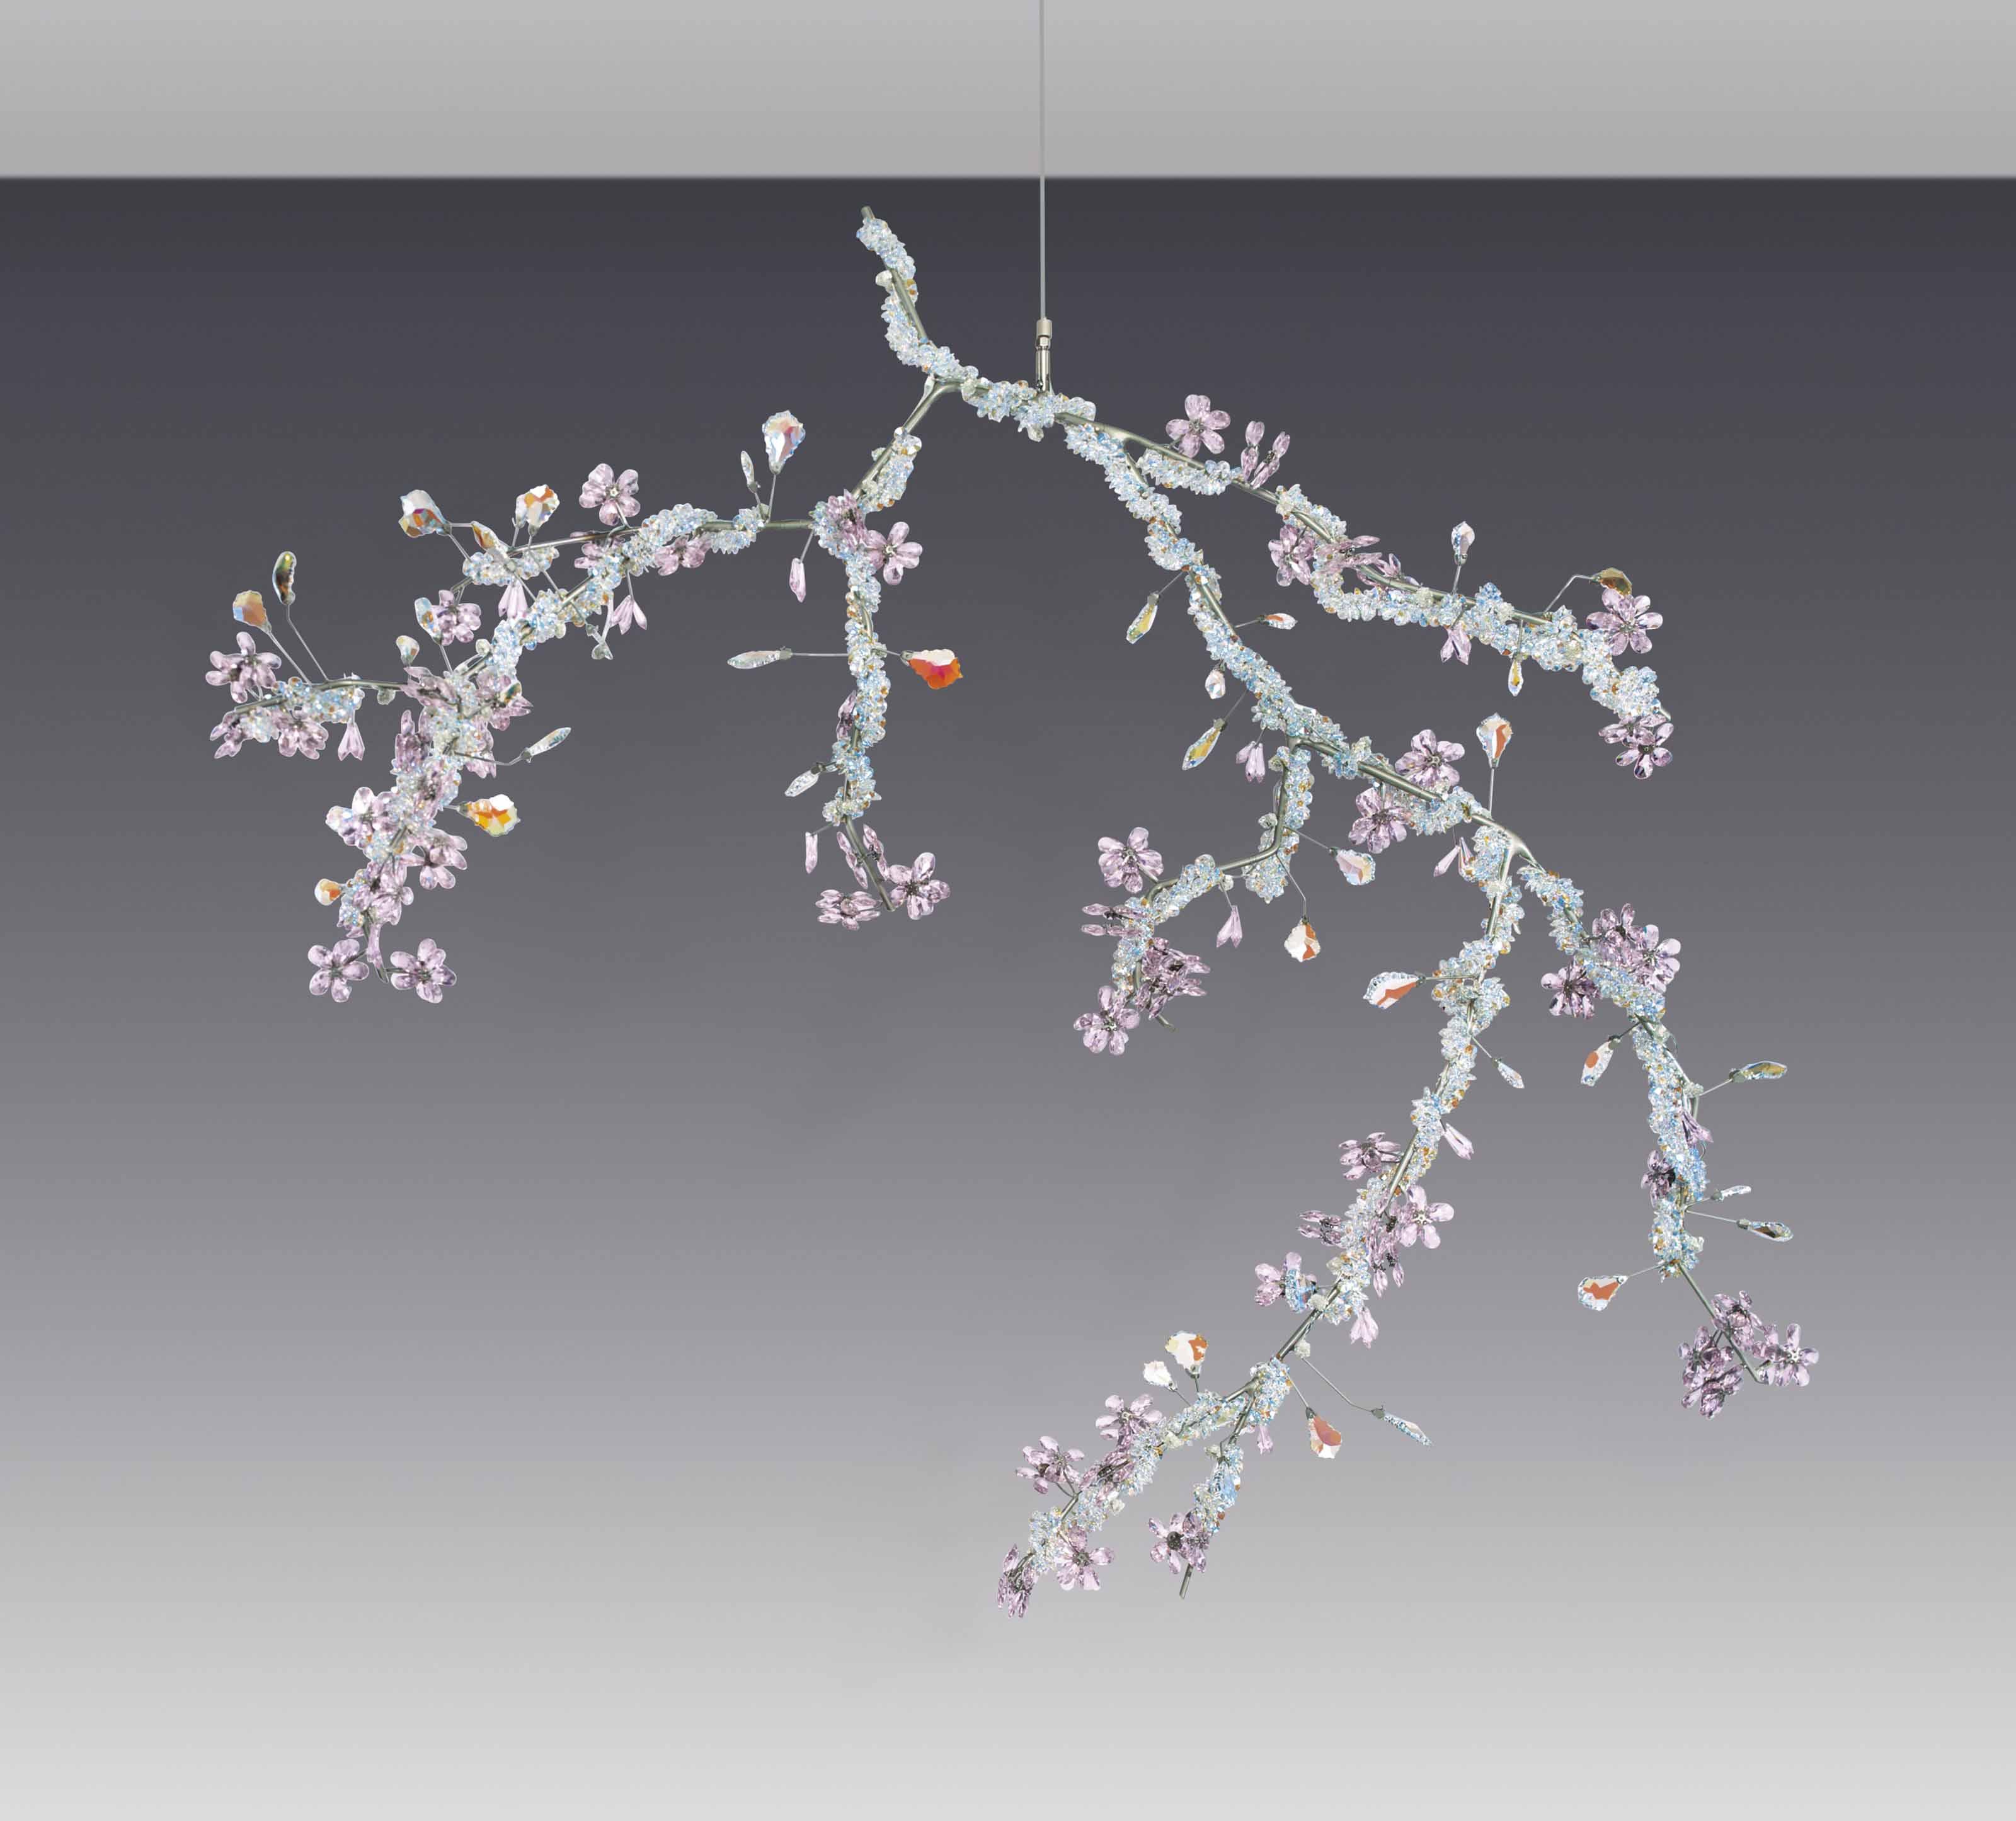 Tord Boontje B 1968 For Swarovski A Large Blossom Chandelier Designed 2002 Flowers Plants Christie S